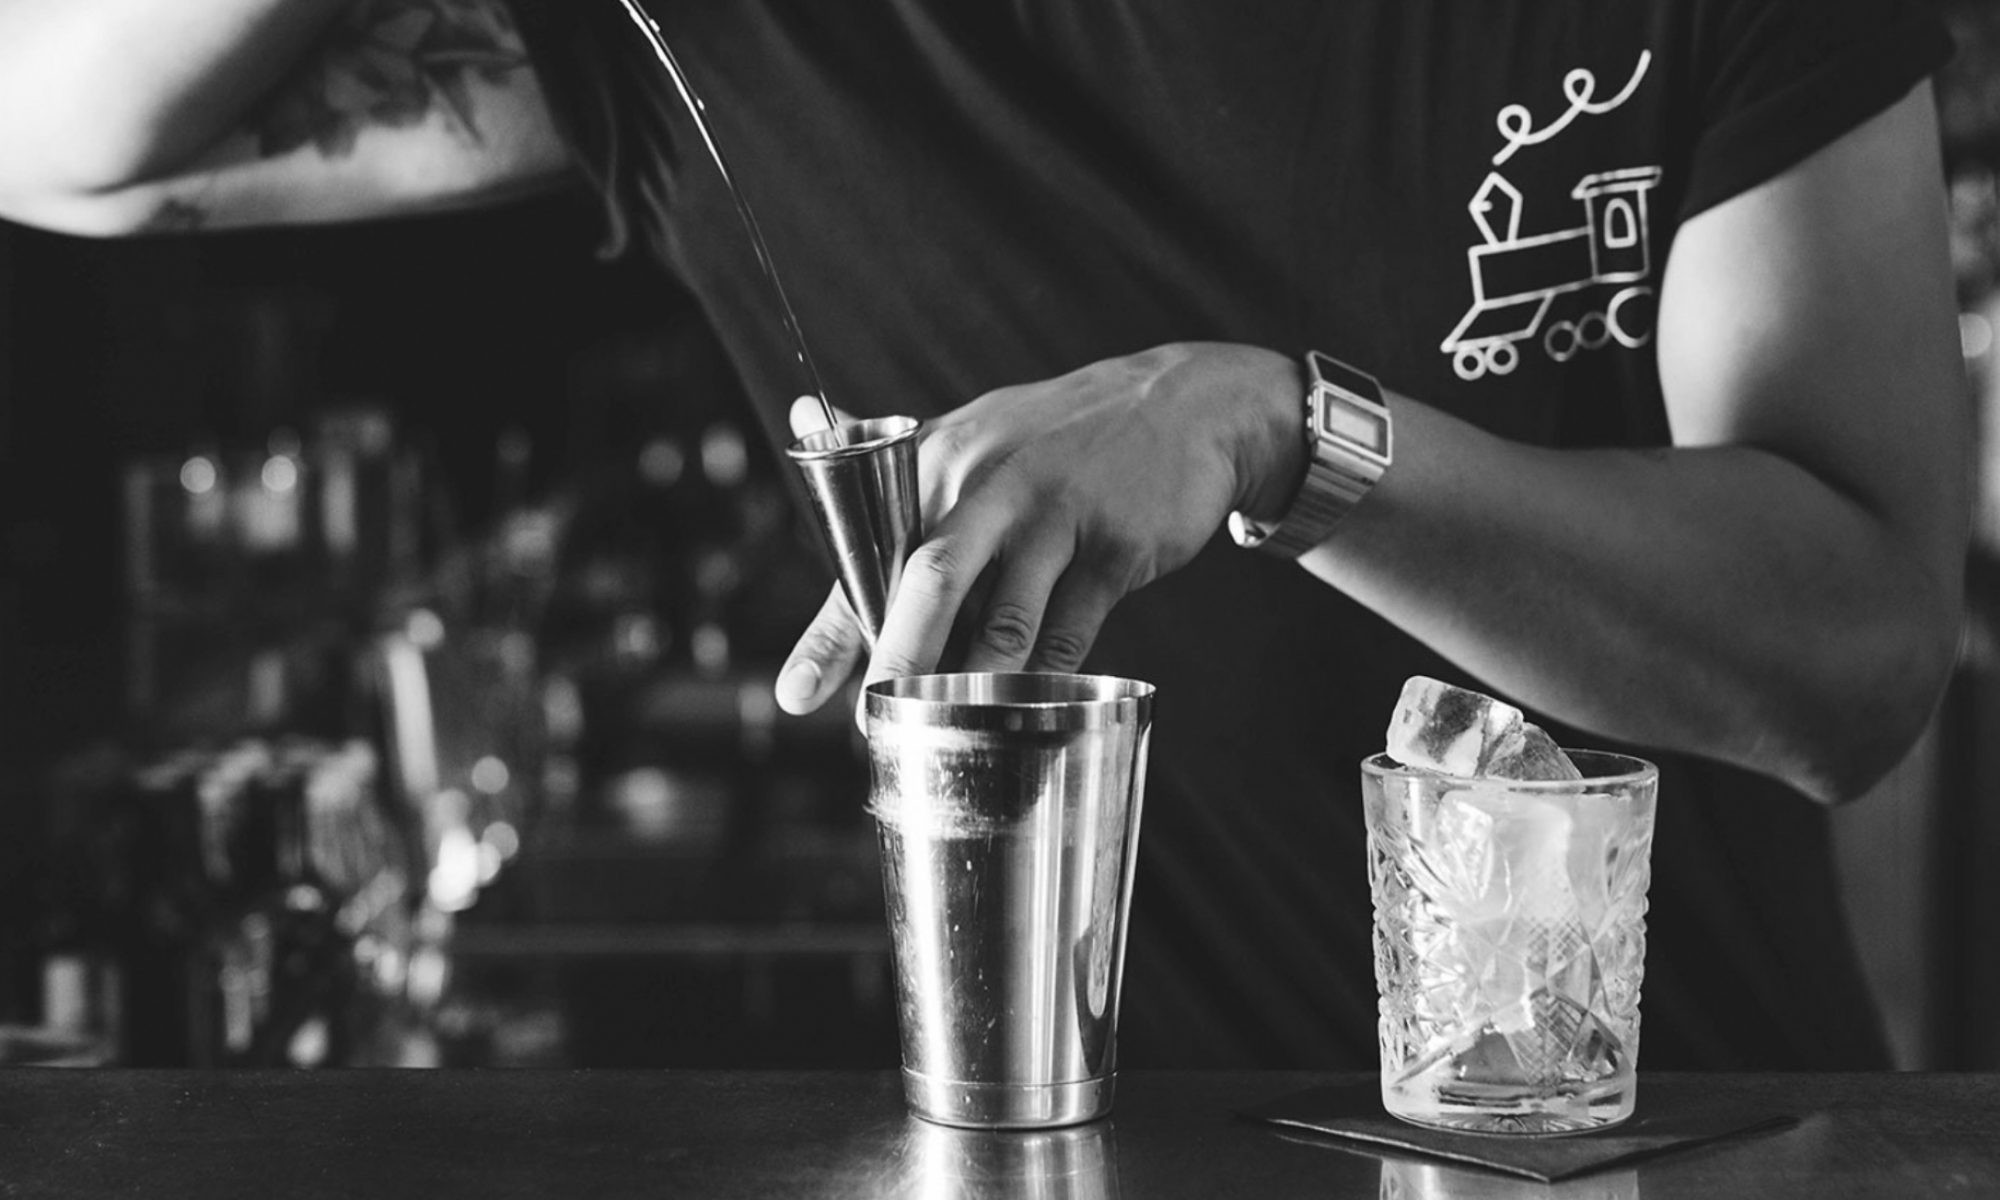 The Beverage Company Australia | LinkedIn